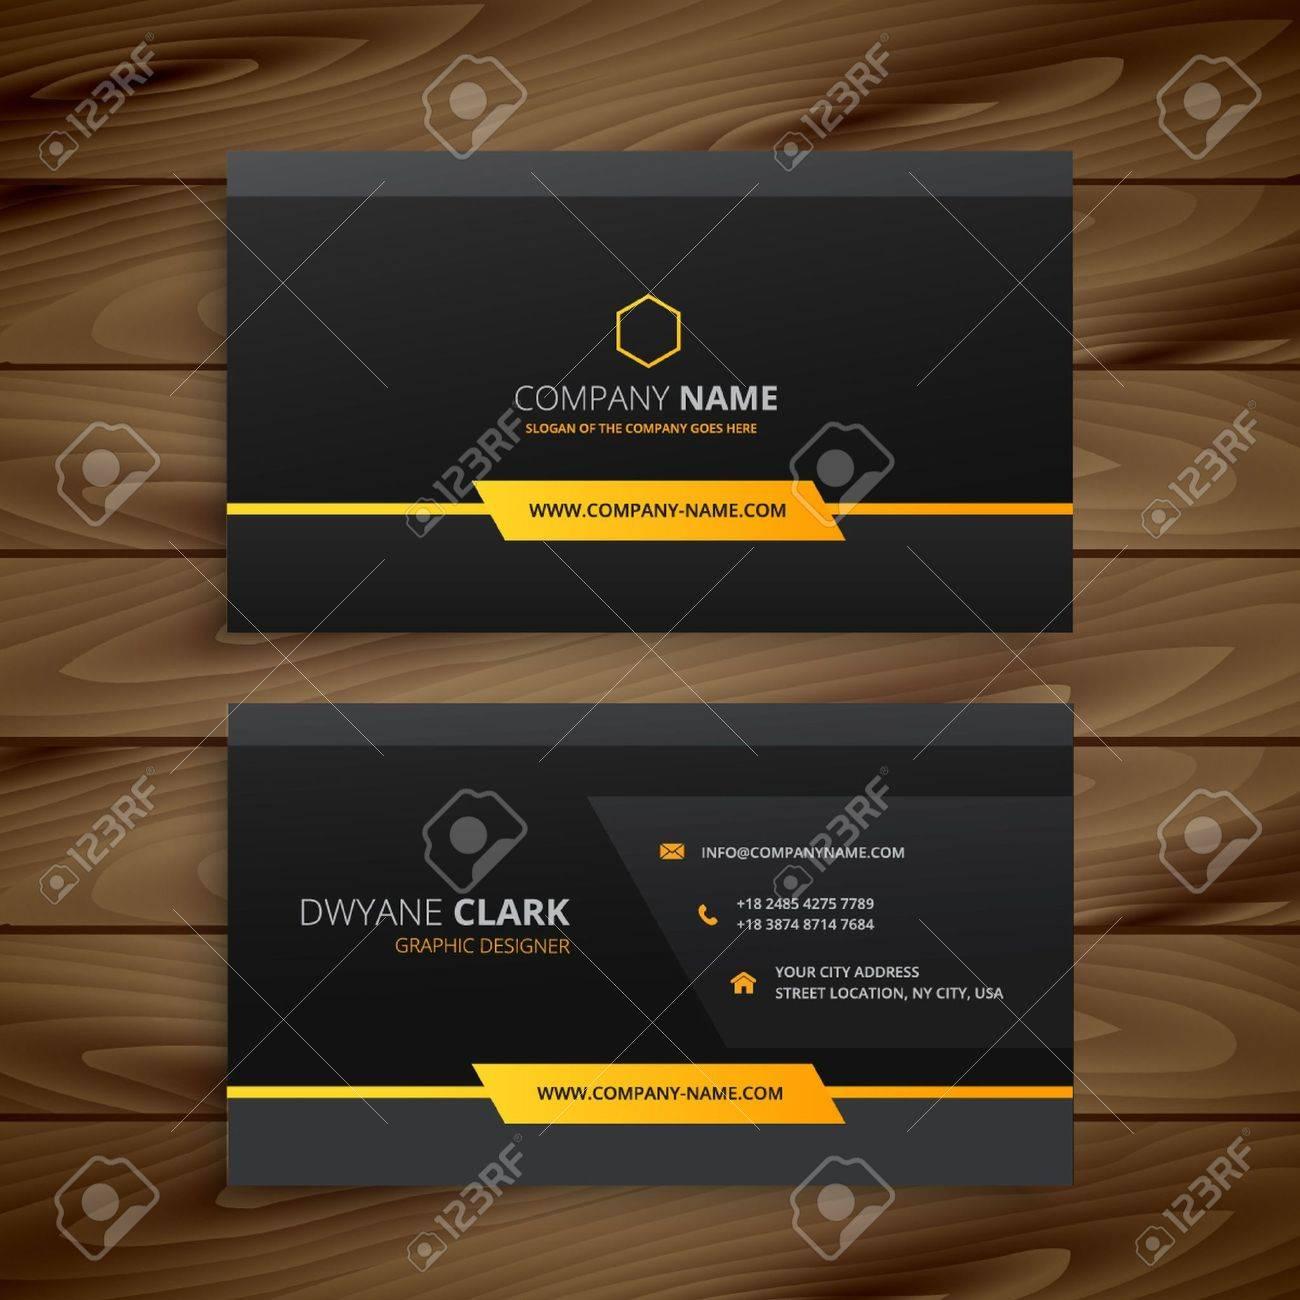 Dark black business card royalty free cliparts vectors and stock dark black business card stock vector 53481940 colourmoves